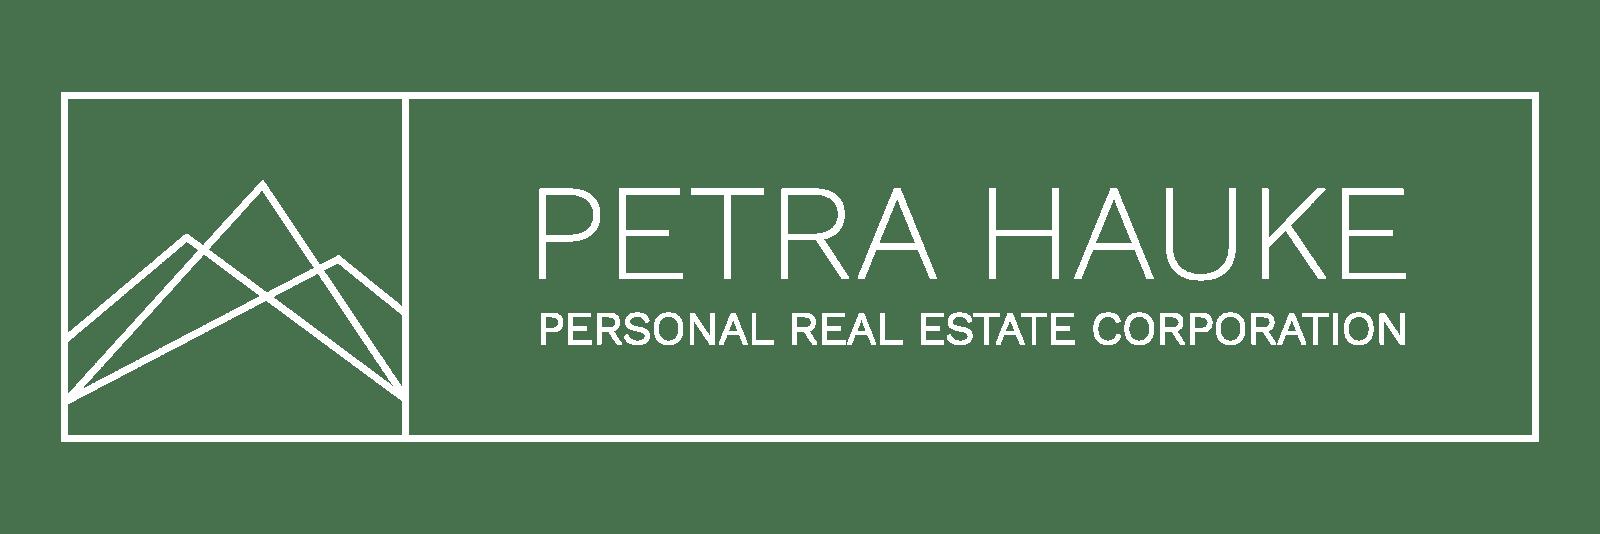 Petra Hauke, Personal Real Estate Corporation